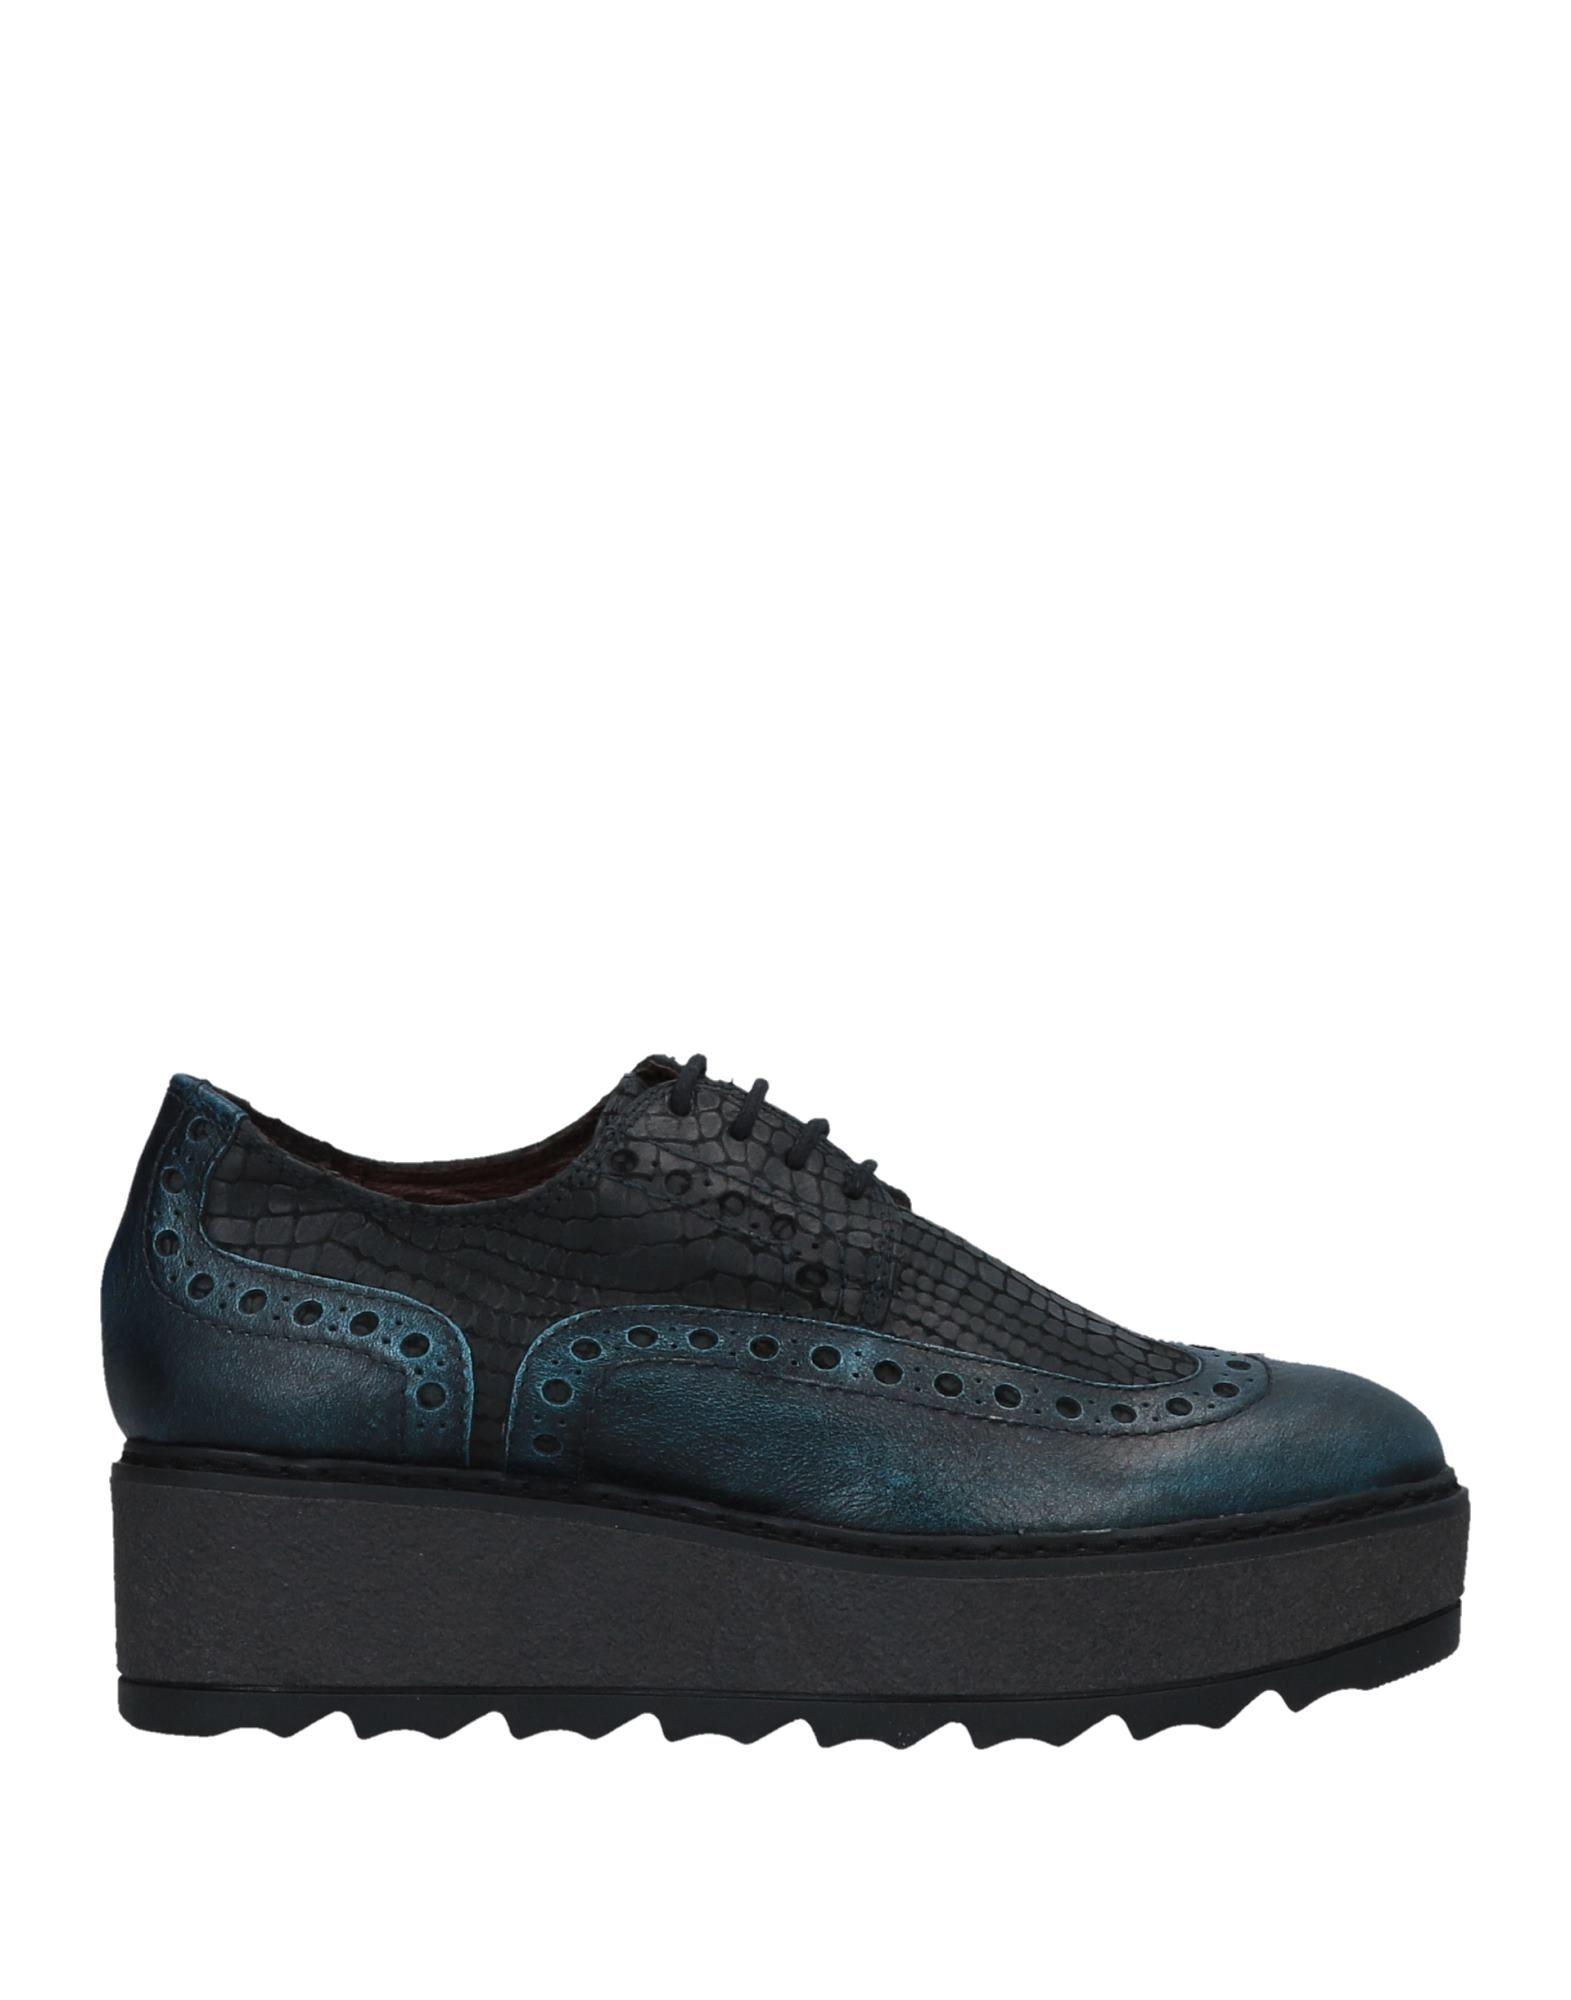 Manas Schnürschuhe Damen  11512744WX Gute Qualität beliebte Schuhe